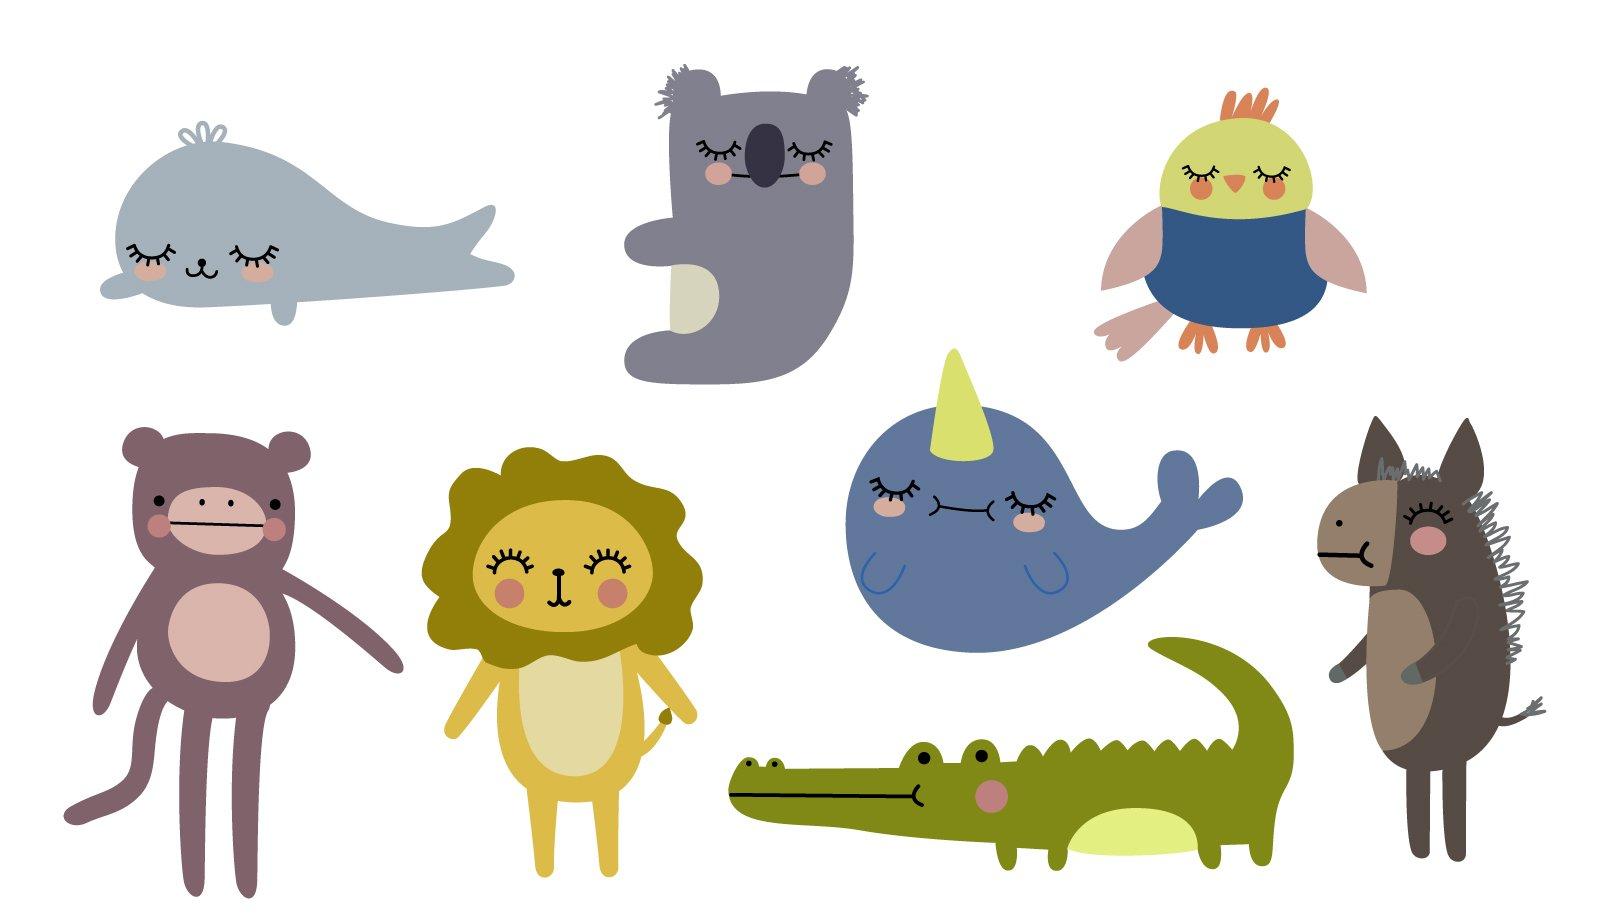 Digital illustrations of animals including seal, monkey, lion, koala, narwhal, alligator, bird, and donkey.